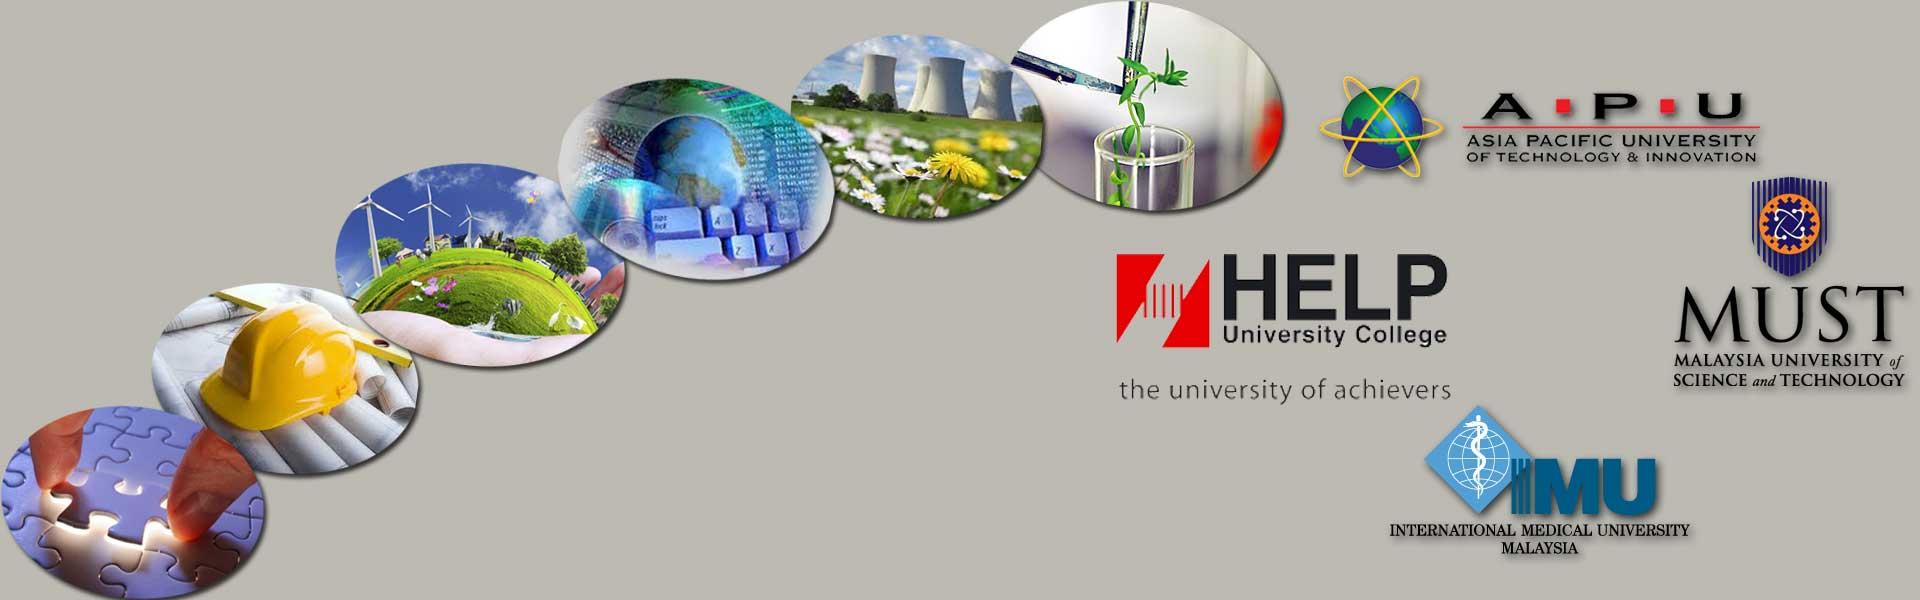 IMU, MUST APU and HELP universities in Malaysia